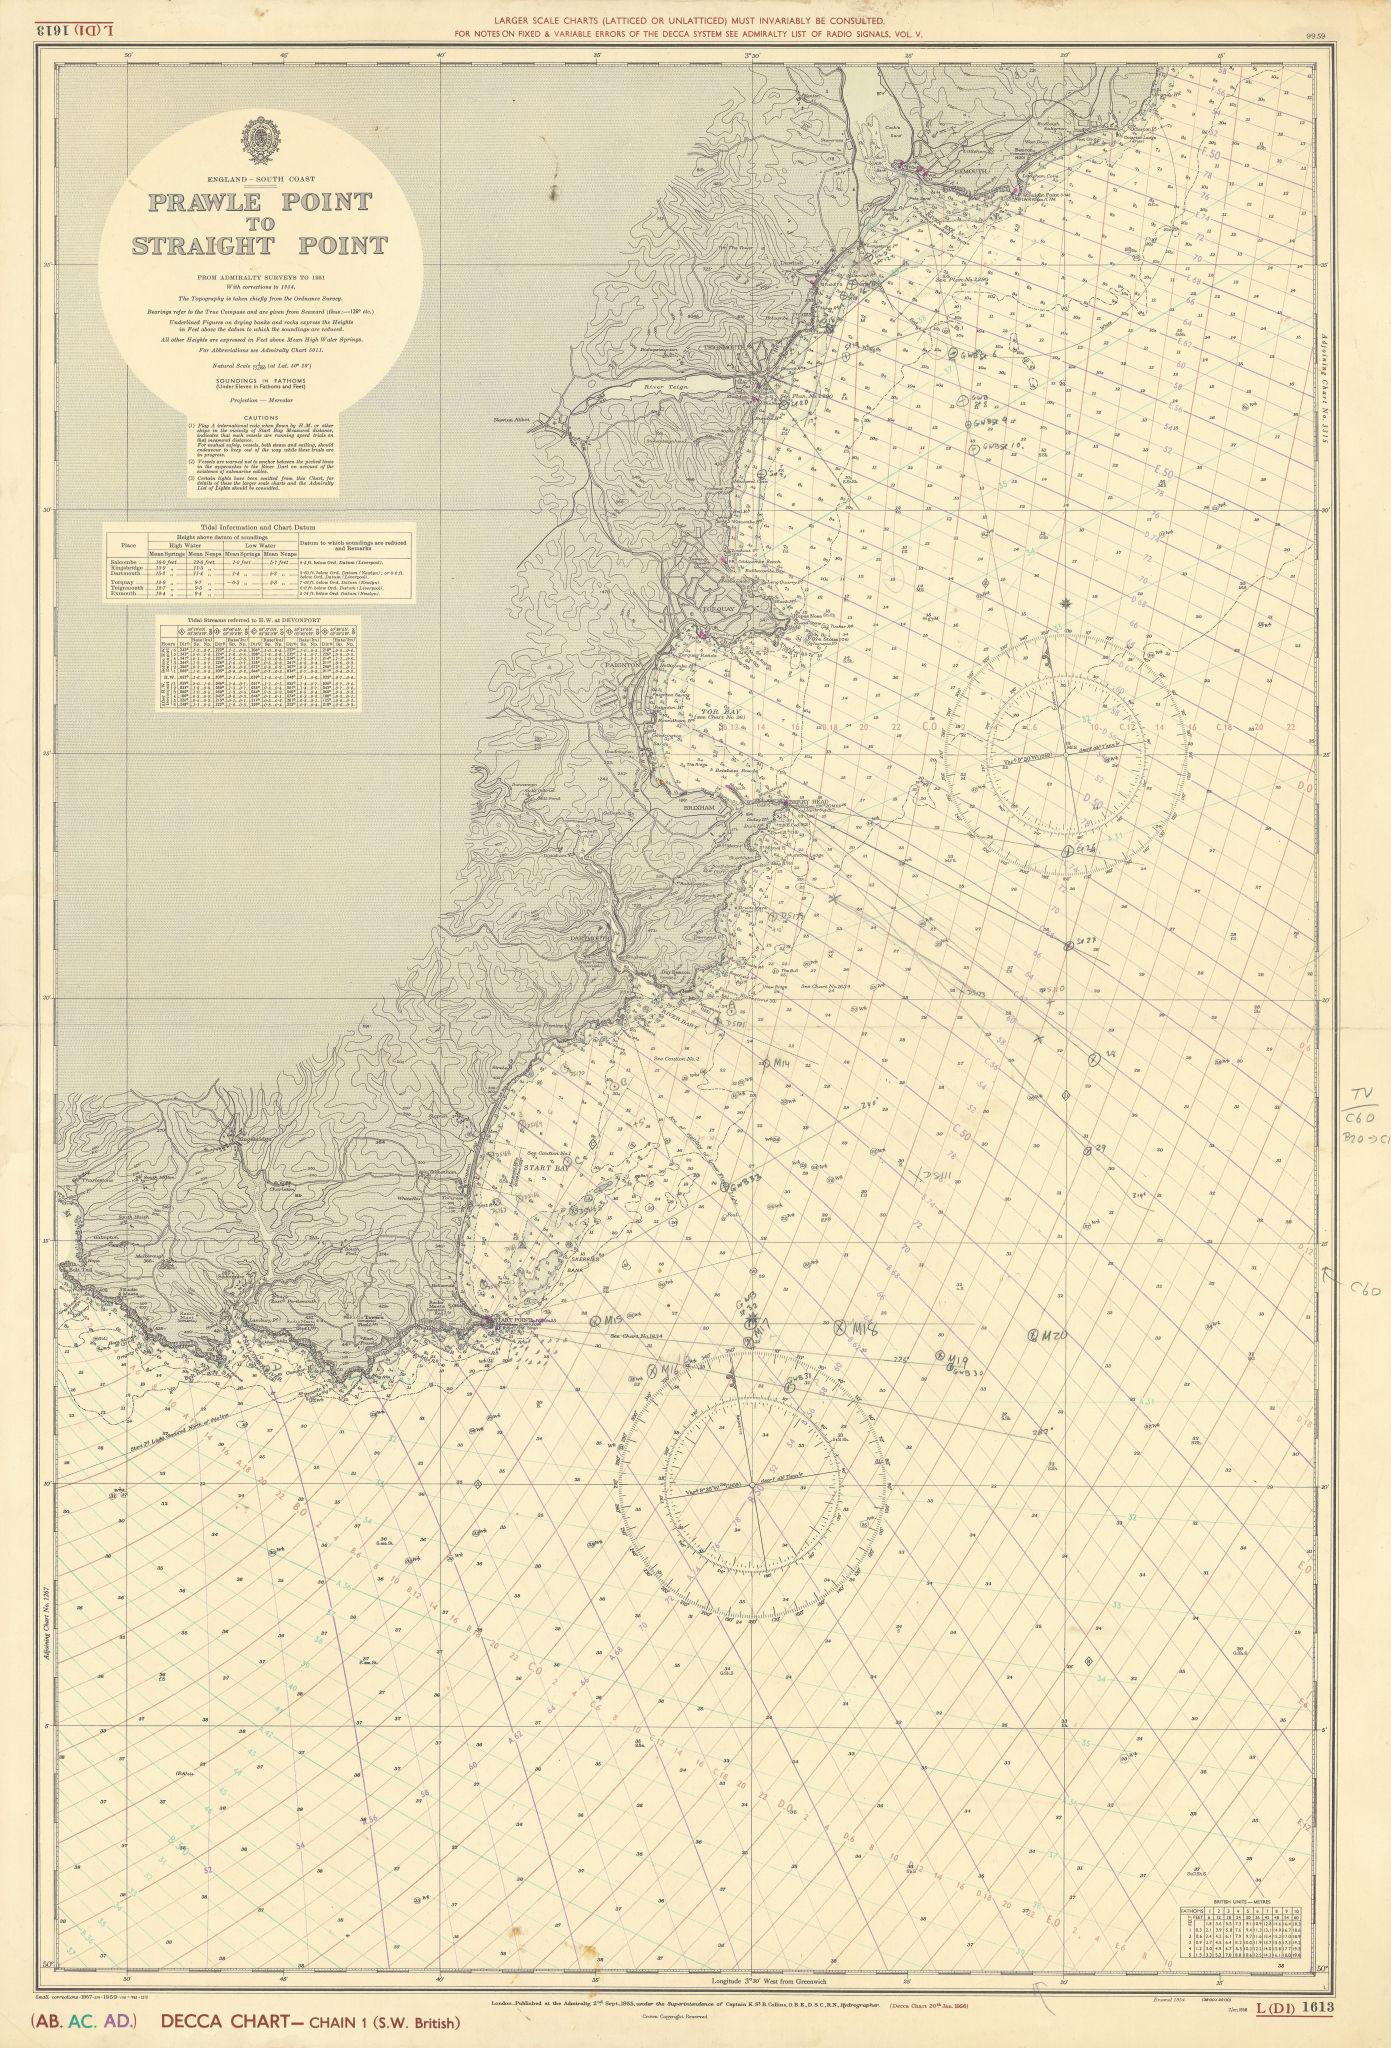 South Devon coast. Prawle Point-Straight Pt. ADMIRALTY sea chart 1955 (1962) map